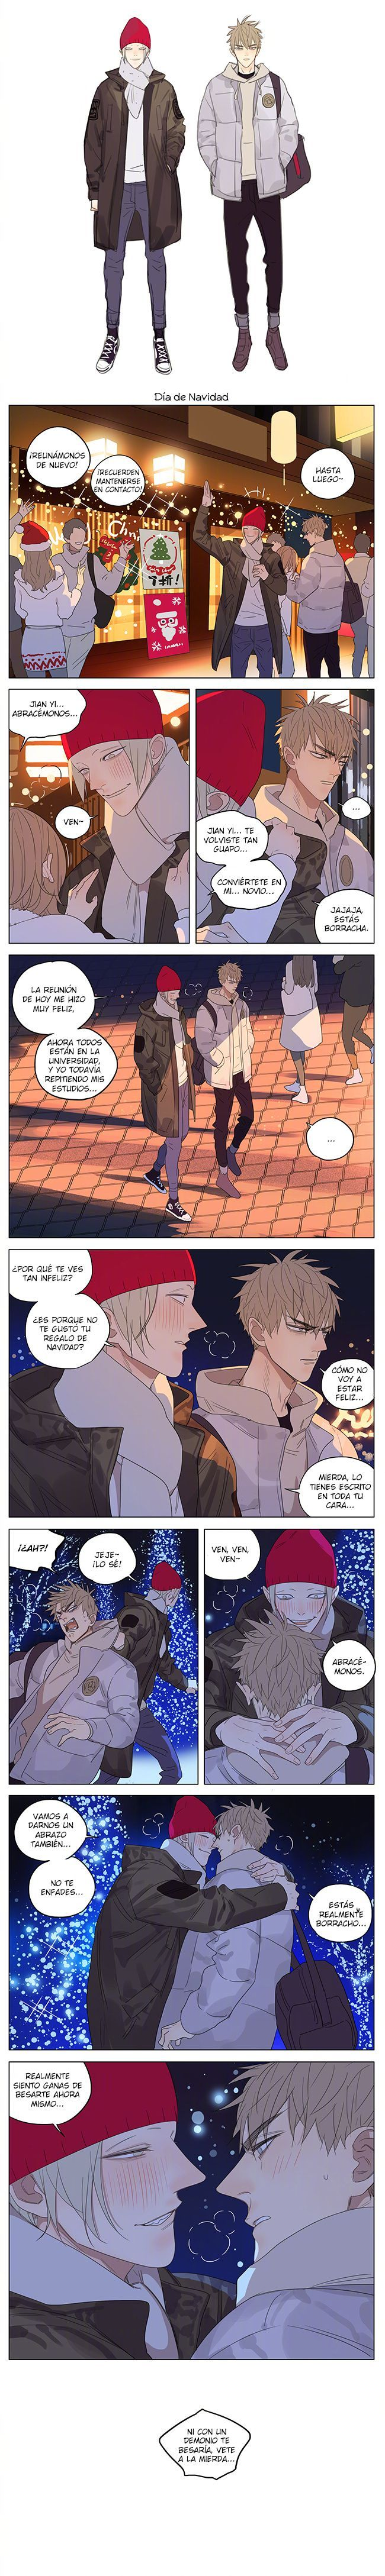 19 Days Capítulo 223.1 página 2, 19 Days Manga Español, lectura 19 Days Capítulo 223.1 online